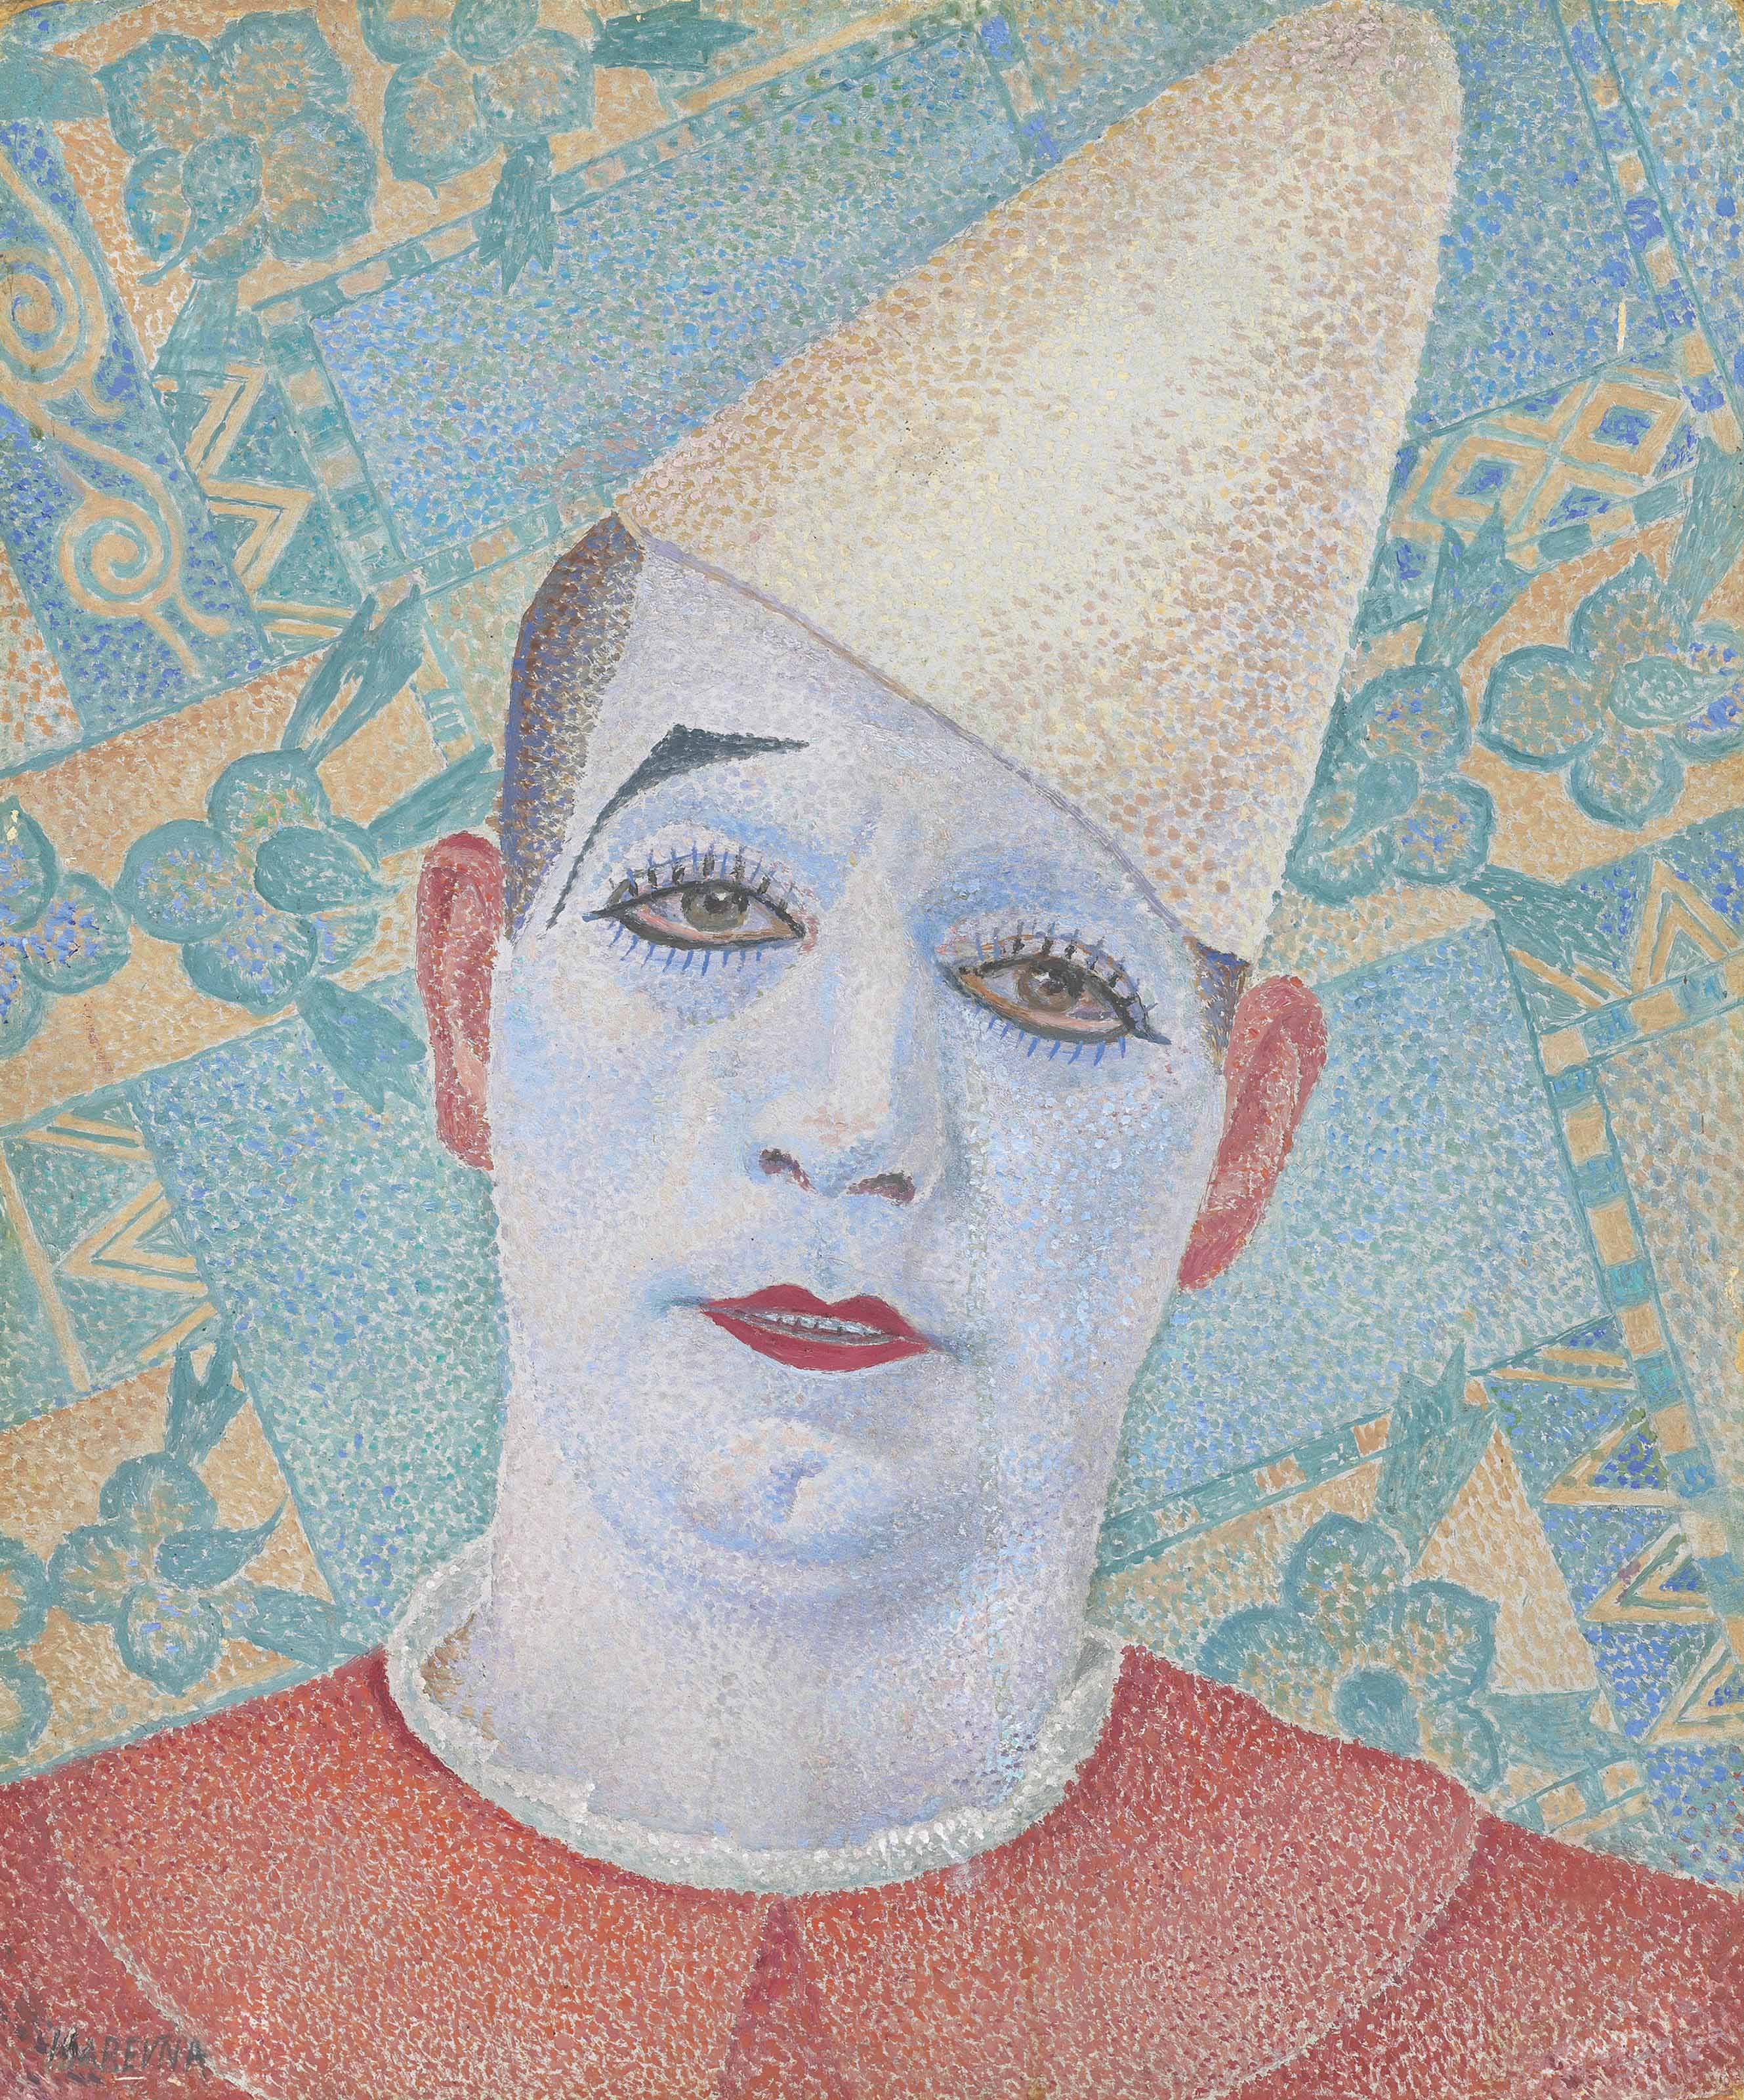 Le clown Aleix du Cirque Medrano